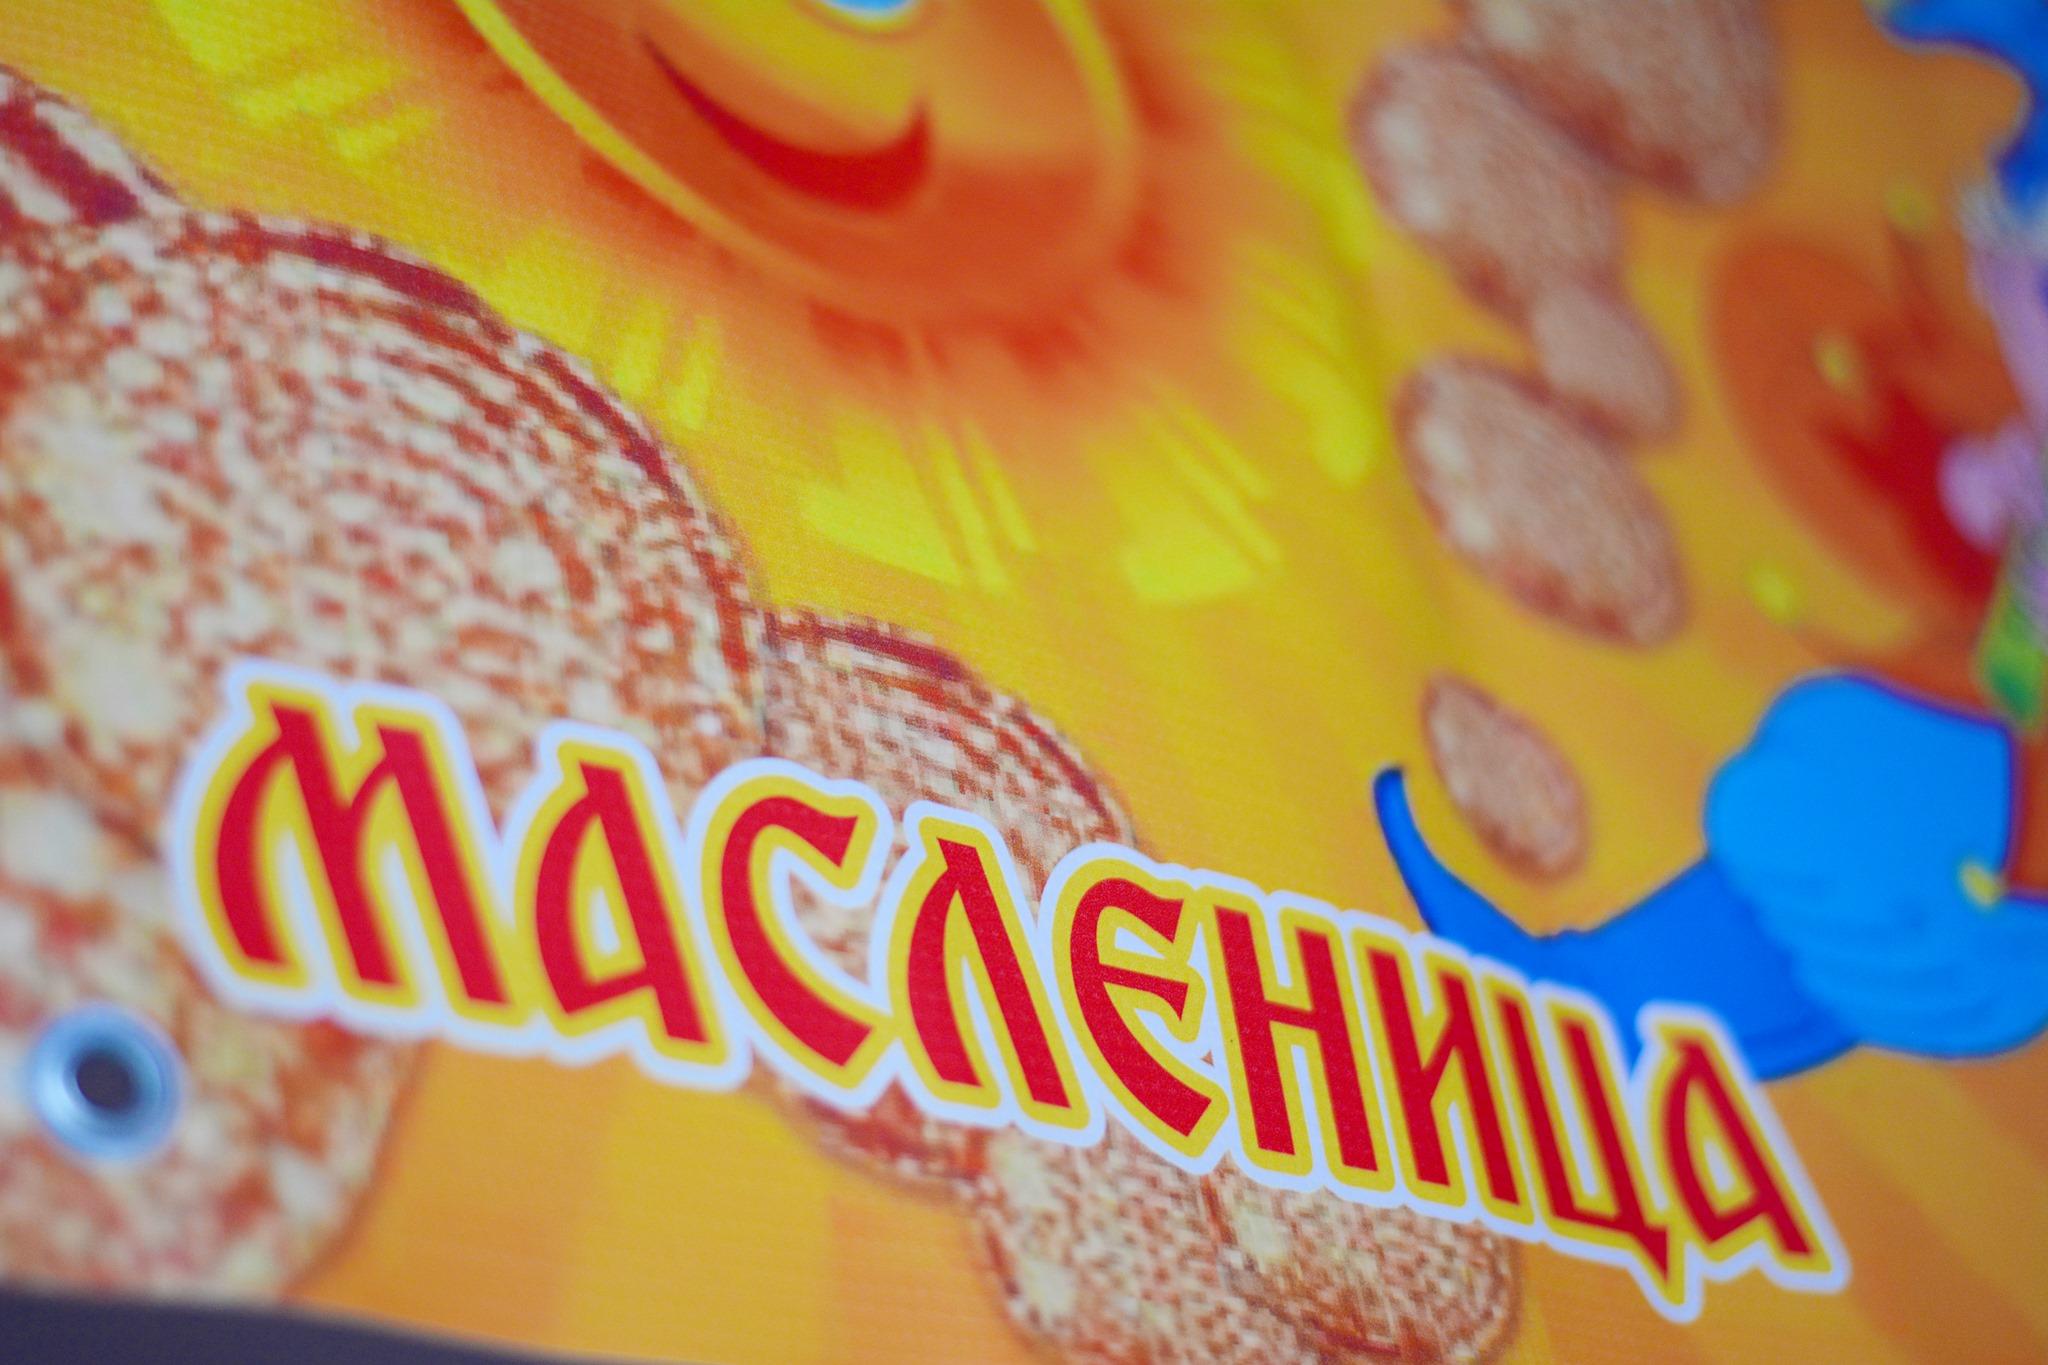 МАСЛЕНИЦА 2021 – прва книга за Свети Николе на руски јазик